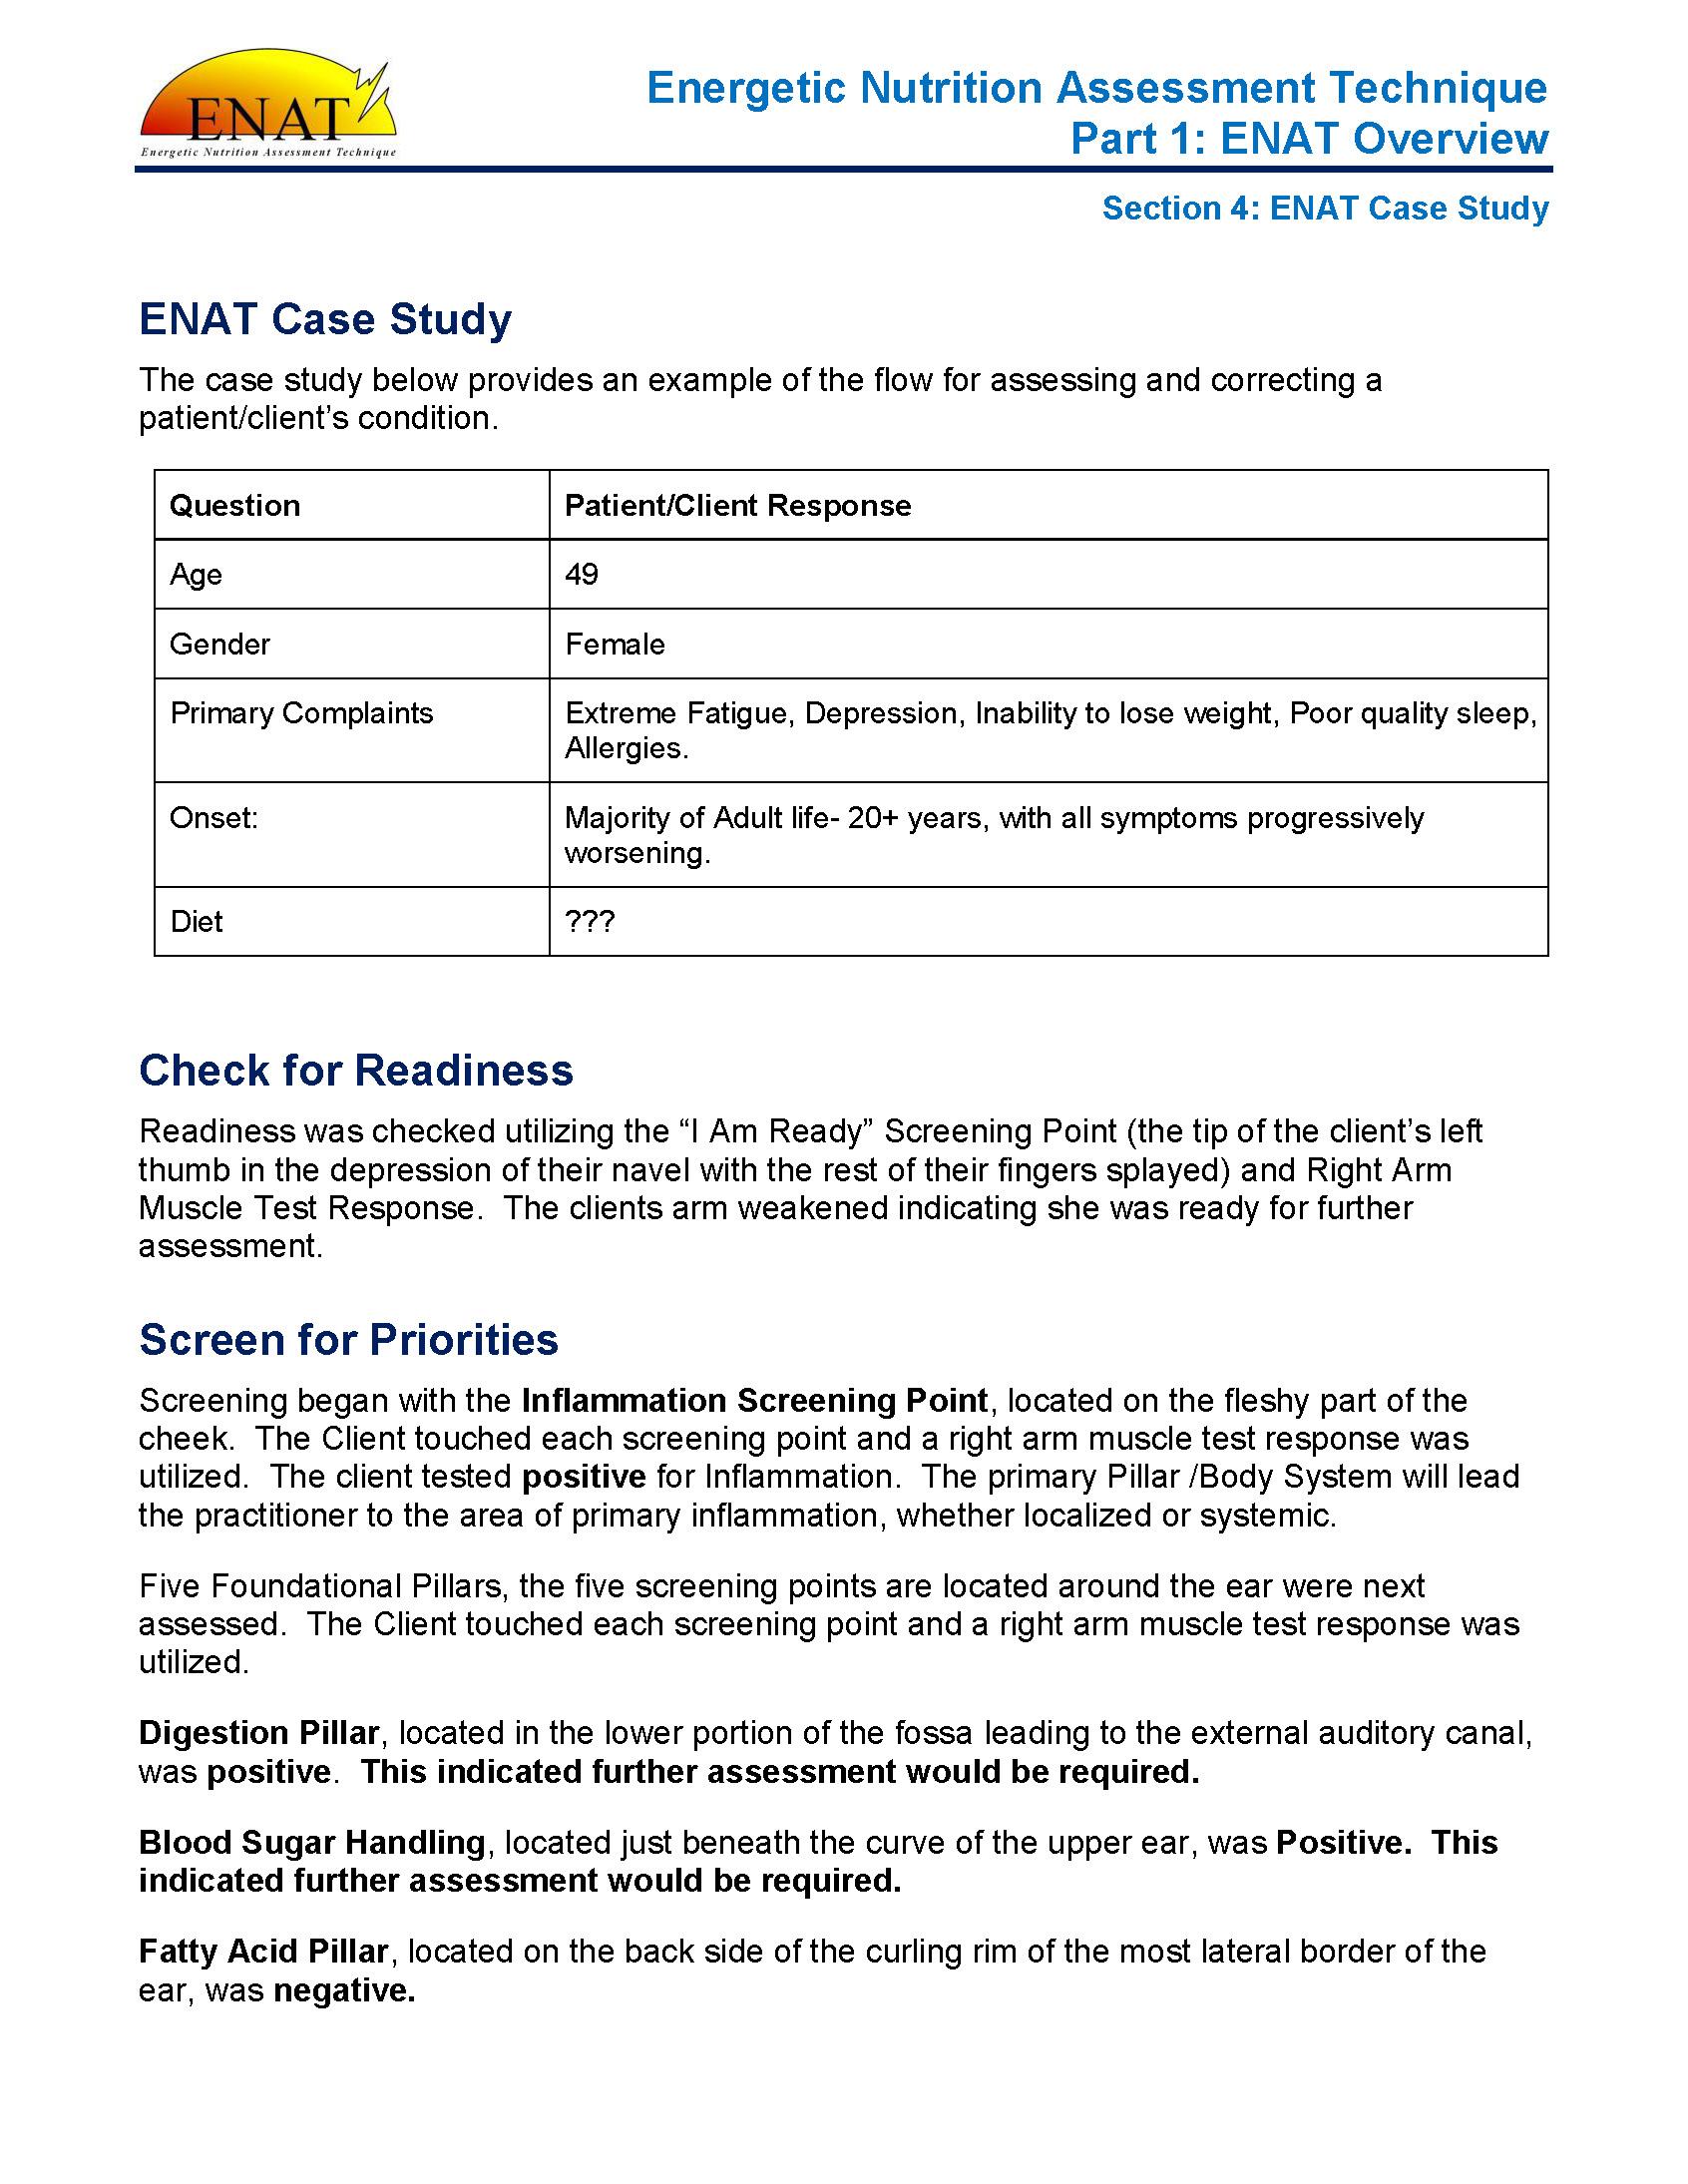 ENAT Case Study 2018_Page_1